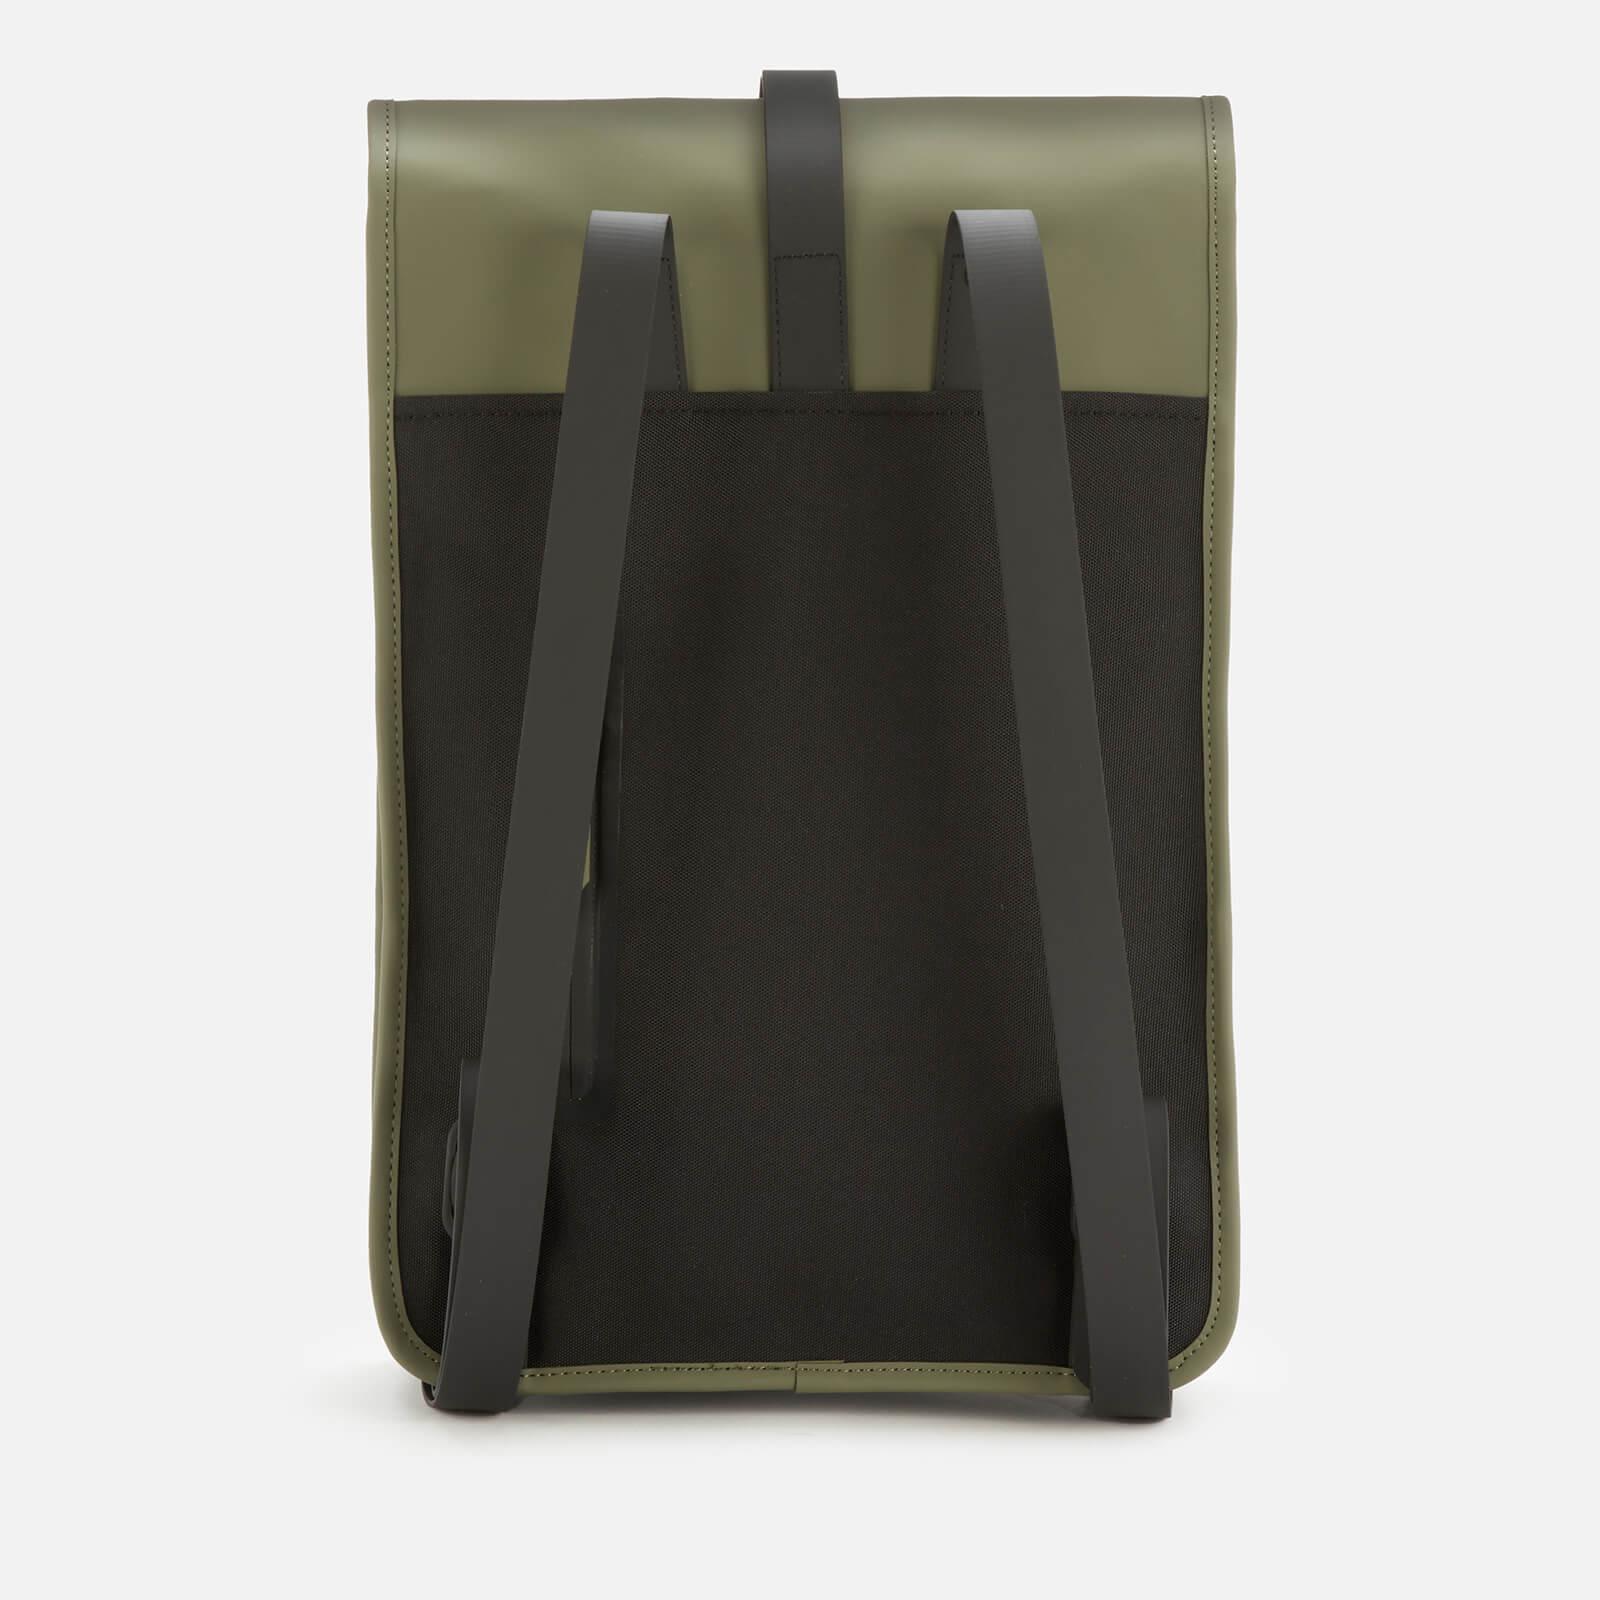 Rains Men's Backpack Mini - Olive